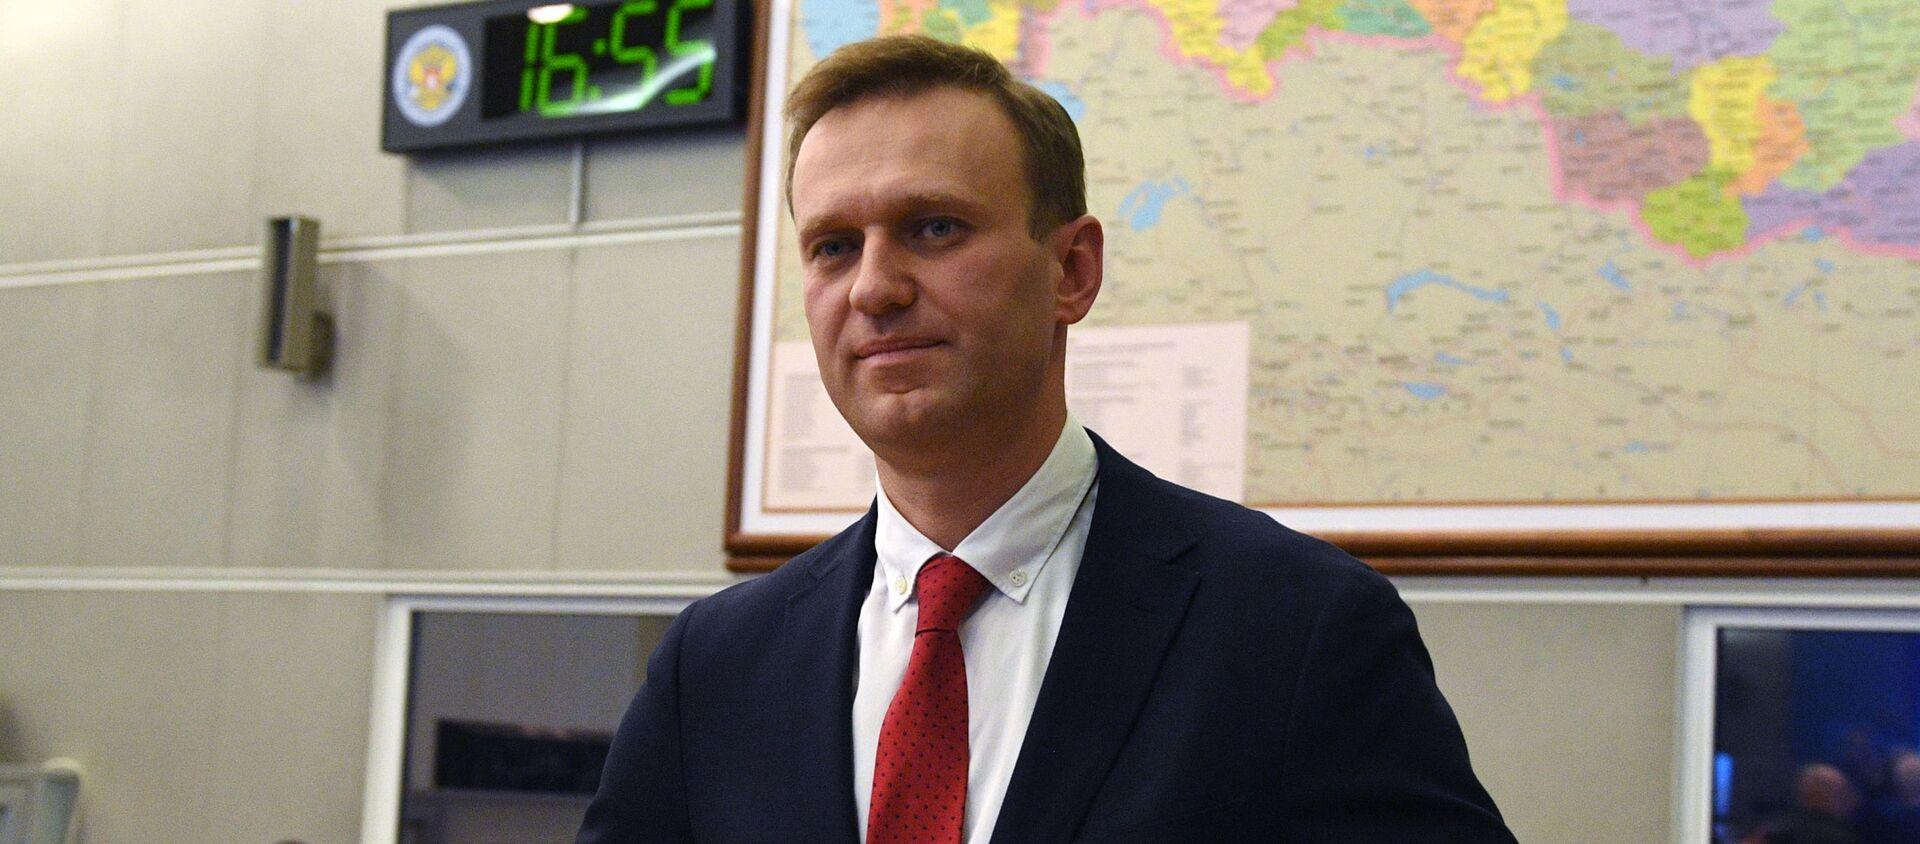 Aleksiej Nawalny, 2017 rok - Sputnik Polska, 1920, 07.09.2020